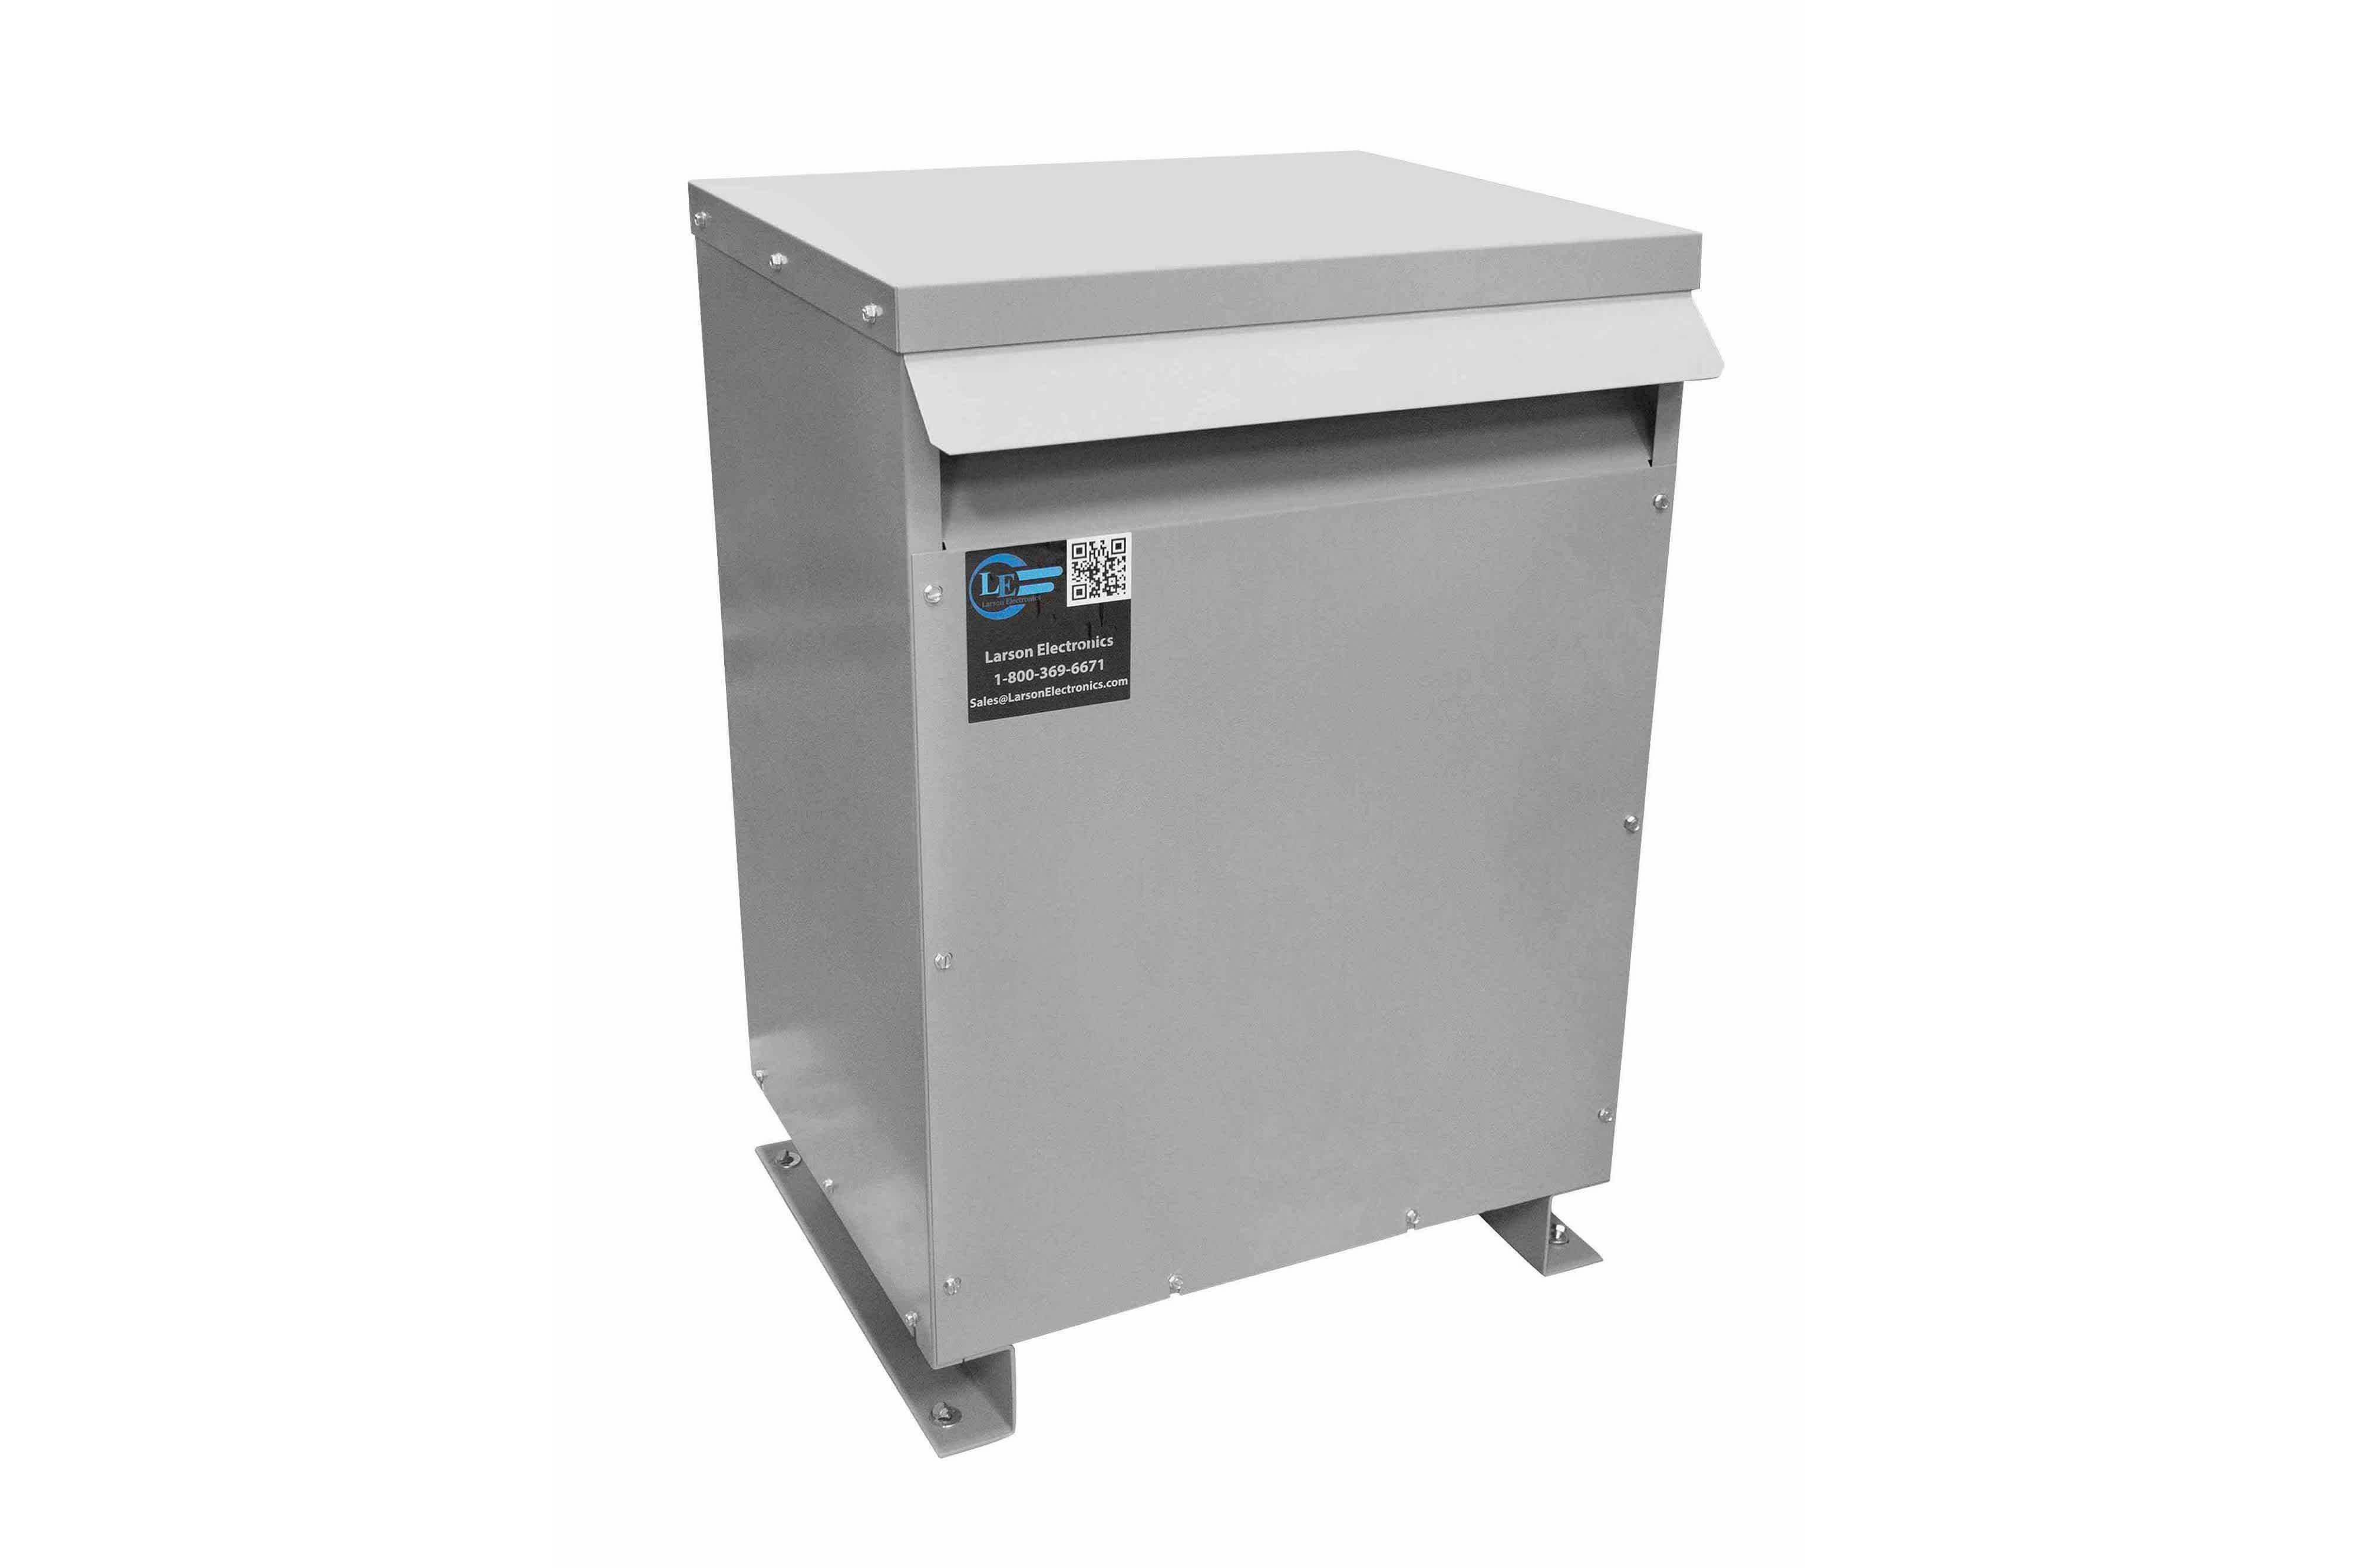 14 kVA 3PH Isolation Transformer, 480V Wye Primary, 400Y/231 Wye-N Secondary, N3R, Ventilated, 60 Hz